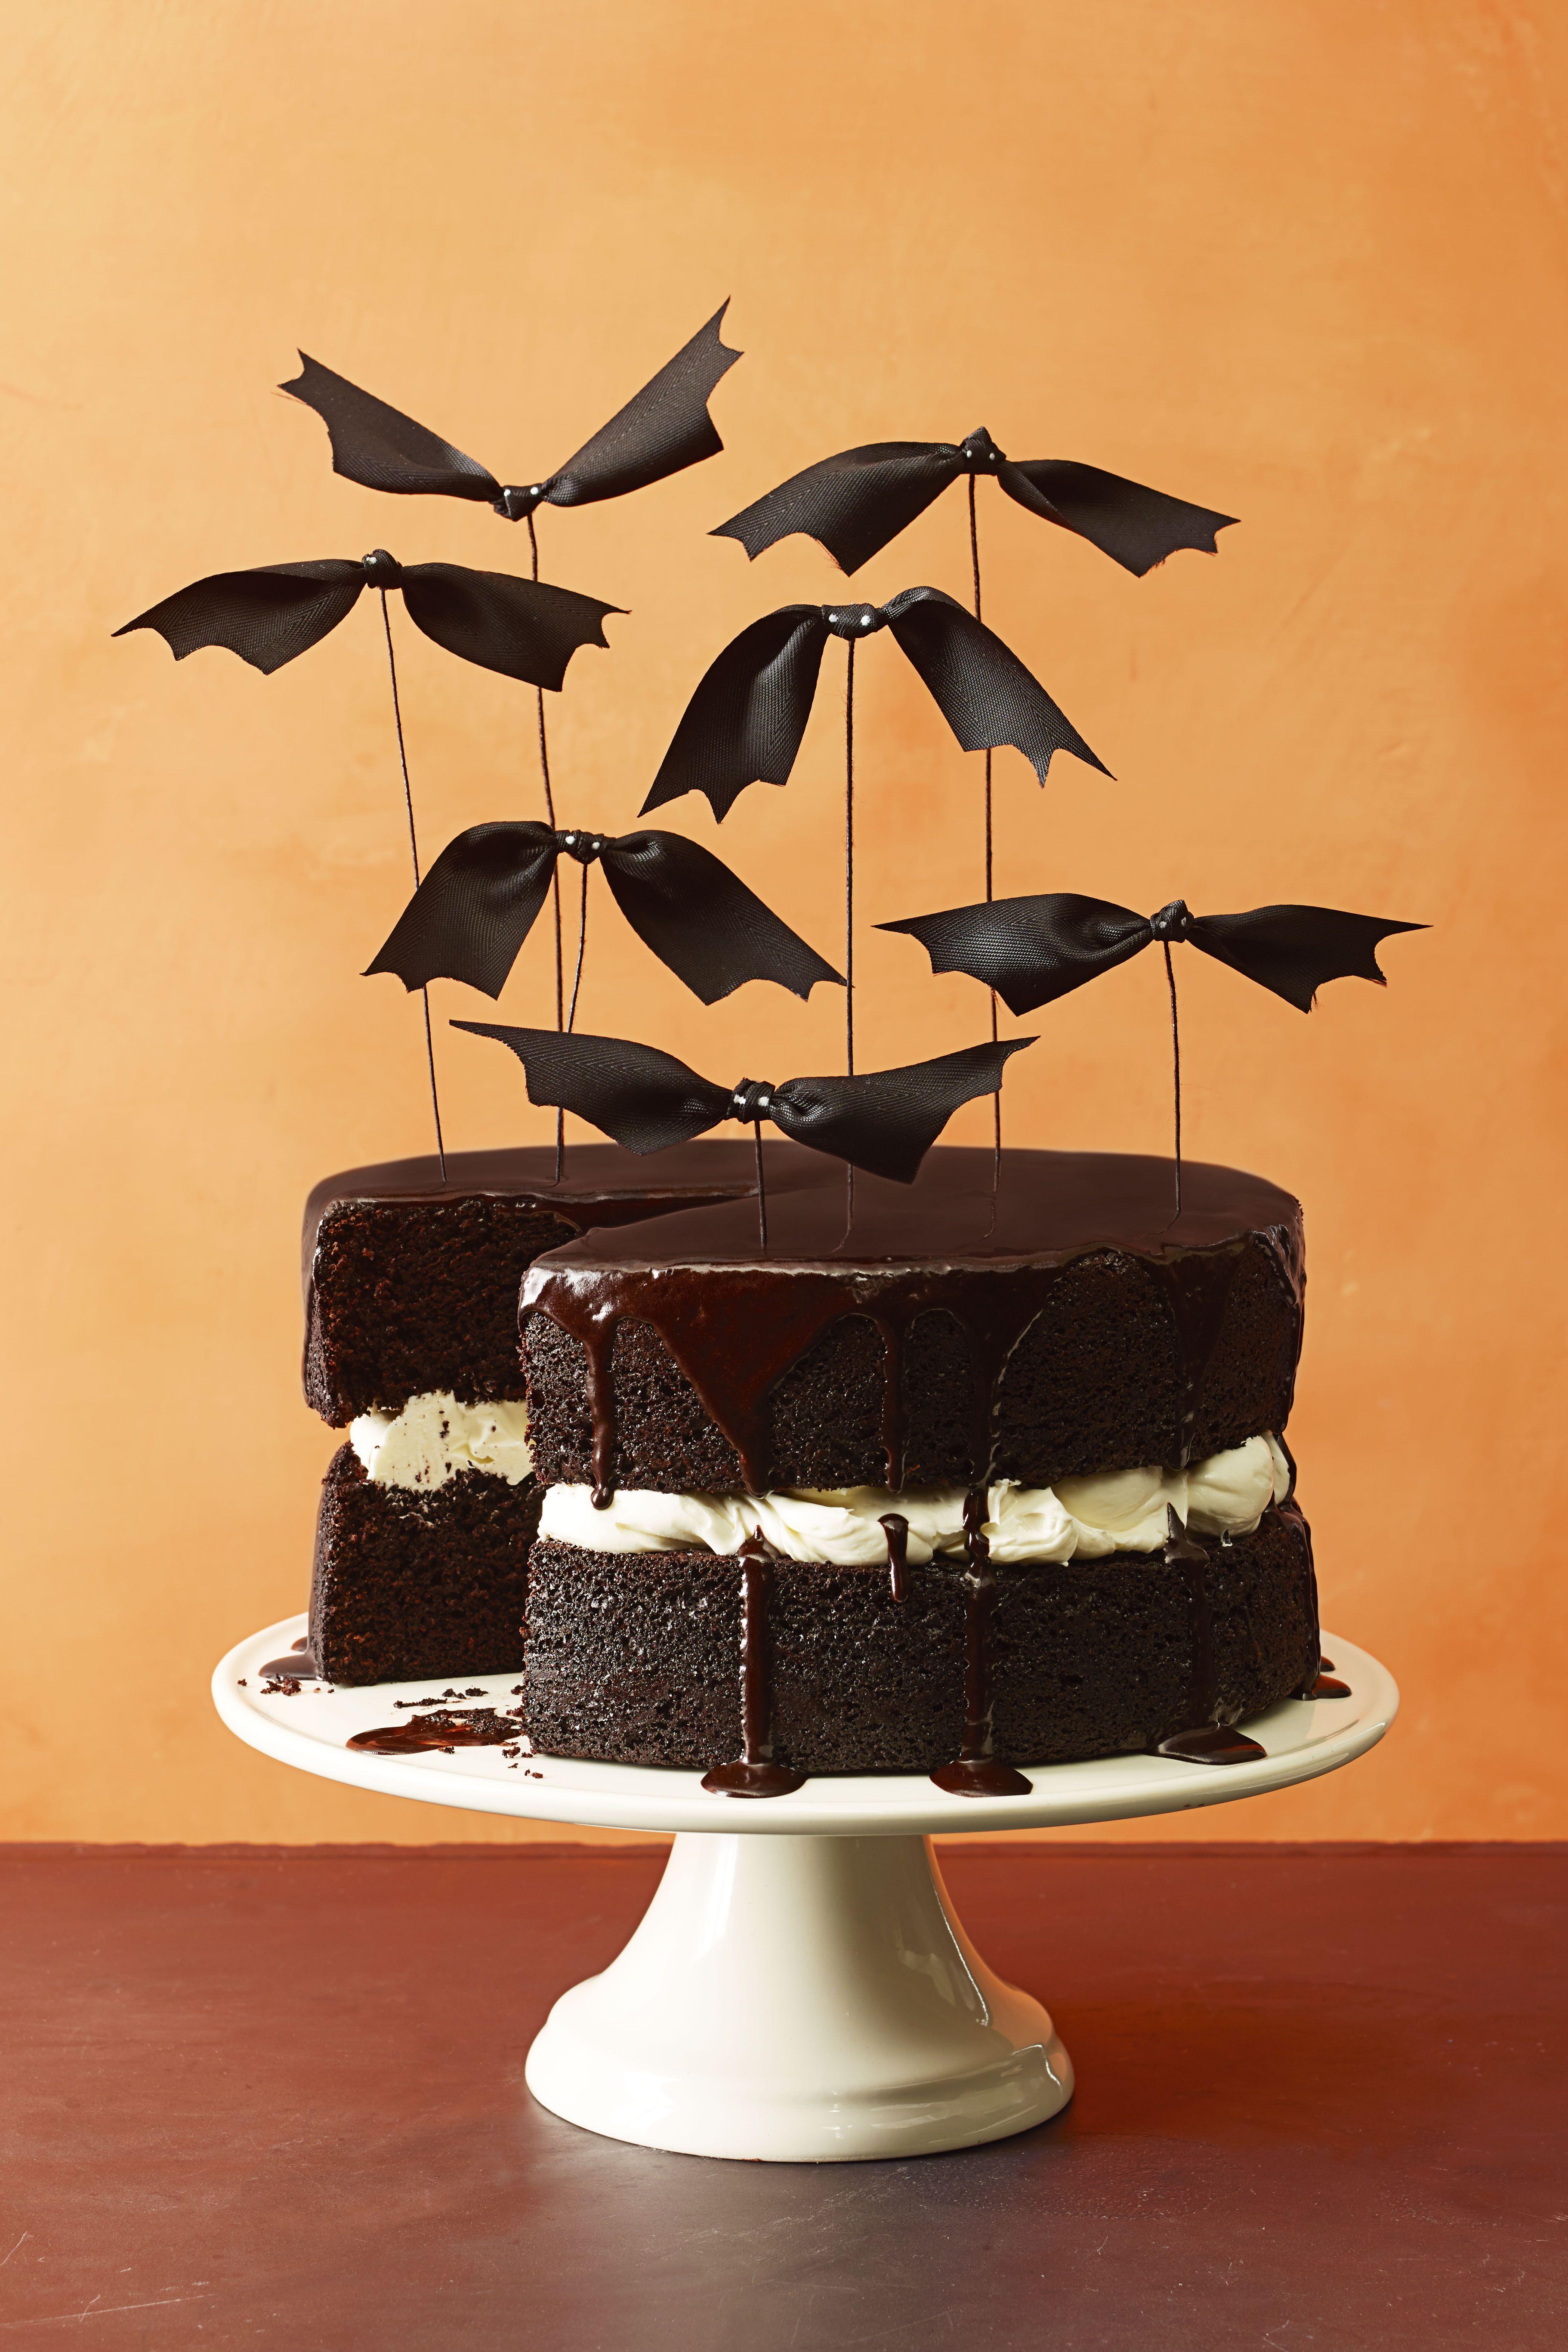 Halloween Cake Ideas 2020 33 Spooky Halloween Cakes   Easy Halloween Cake Ideas